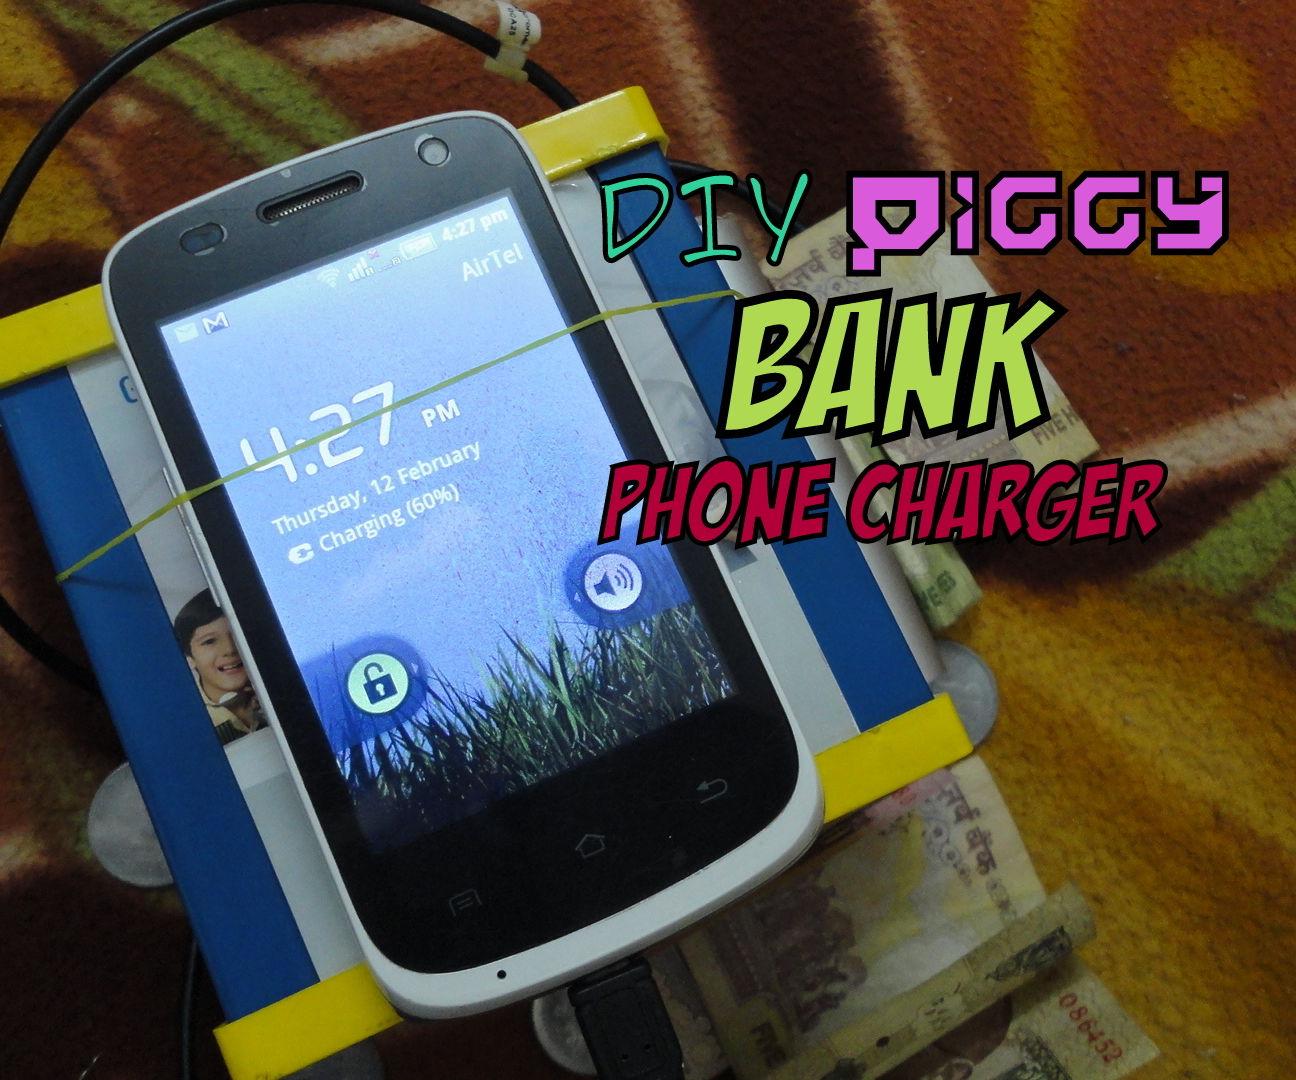 Piggy Bank Smartphone Charger (that still saves money!)